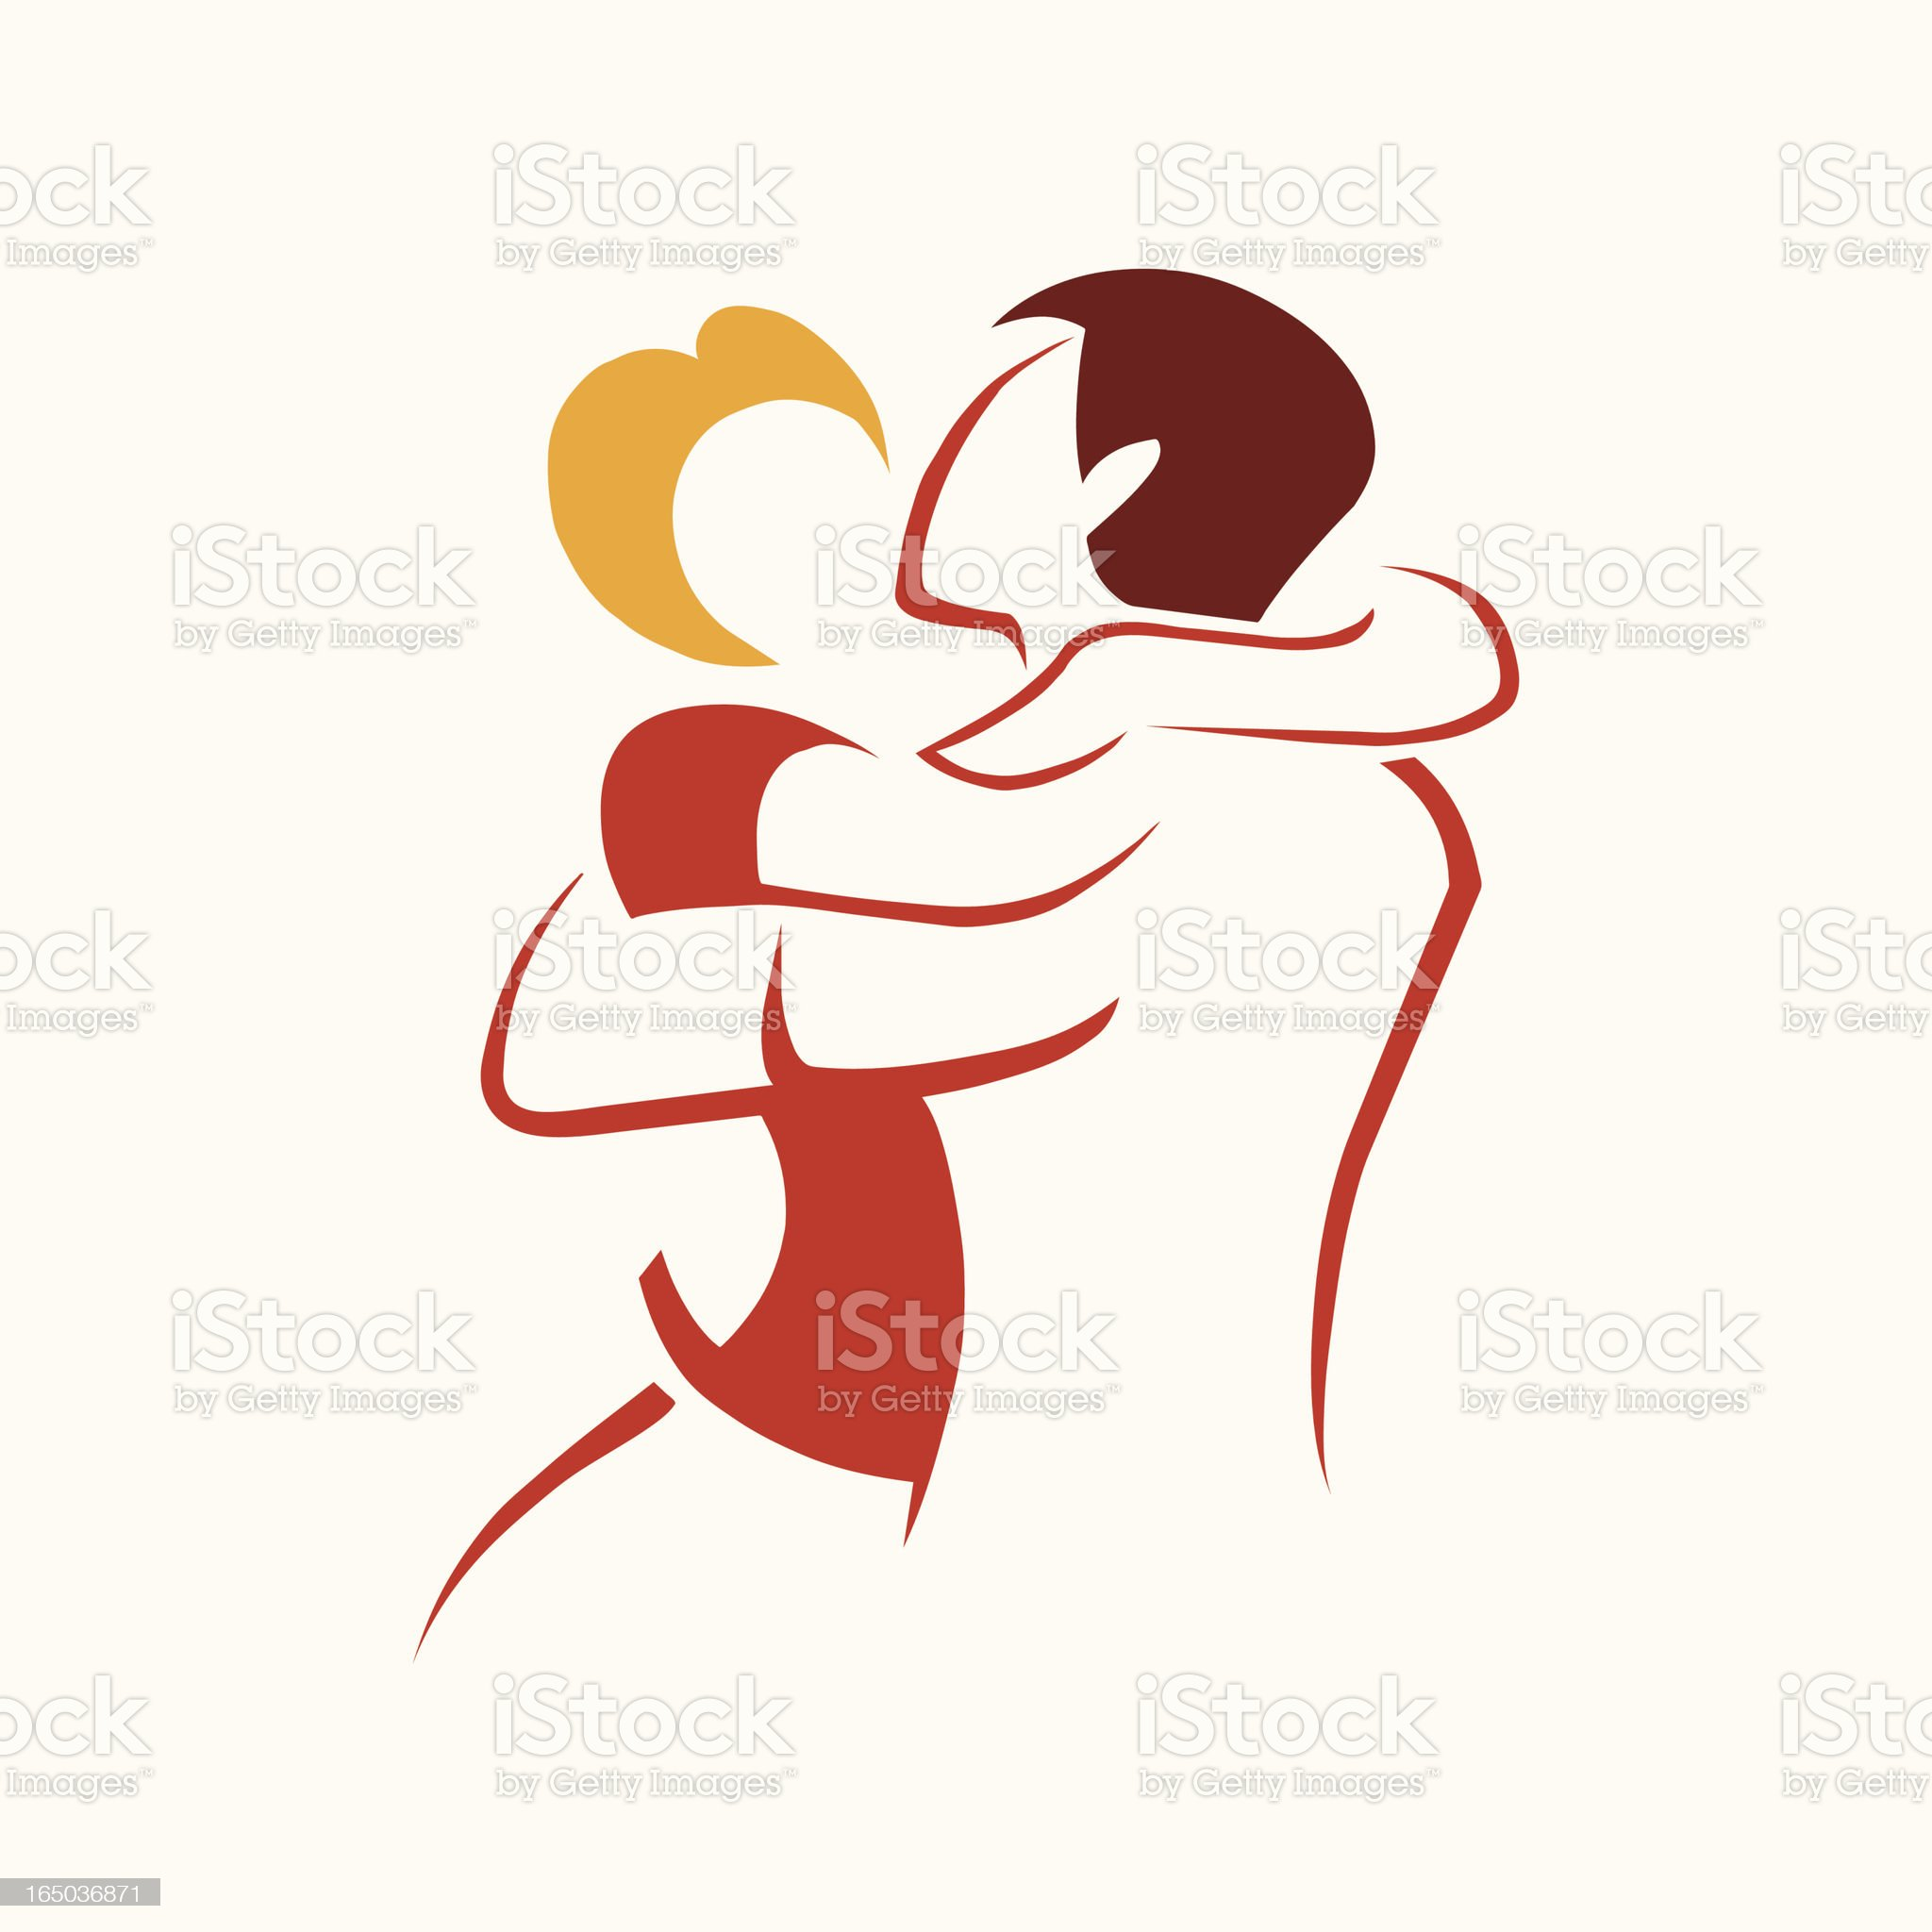 Lovers - vector royalty-free stock vector art